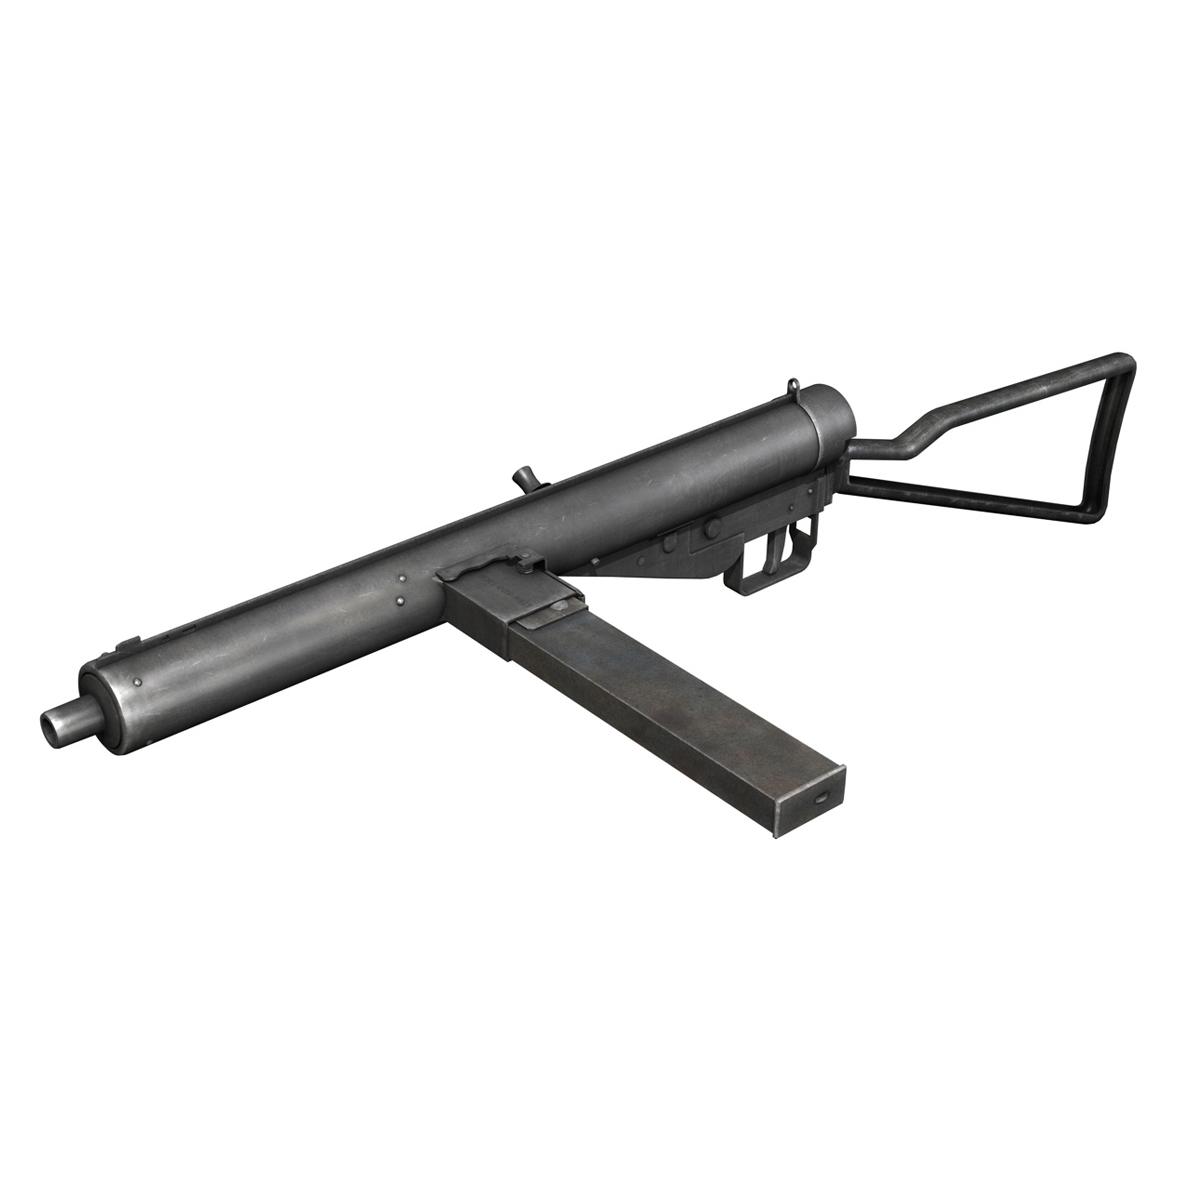 sten mk.iii submachine gun 3d model 3ds fbx c4d lwo obj 195112